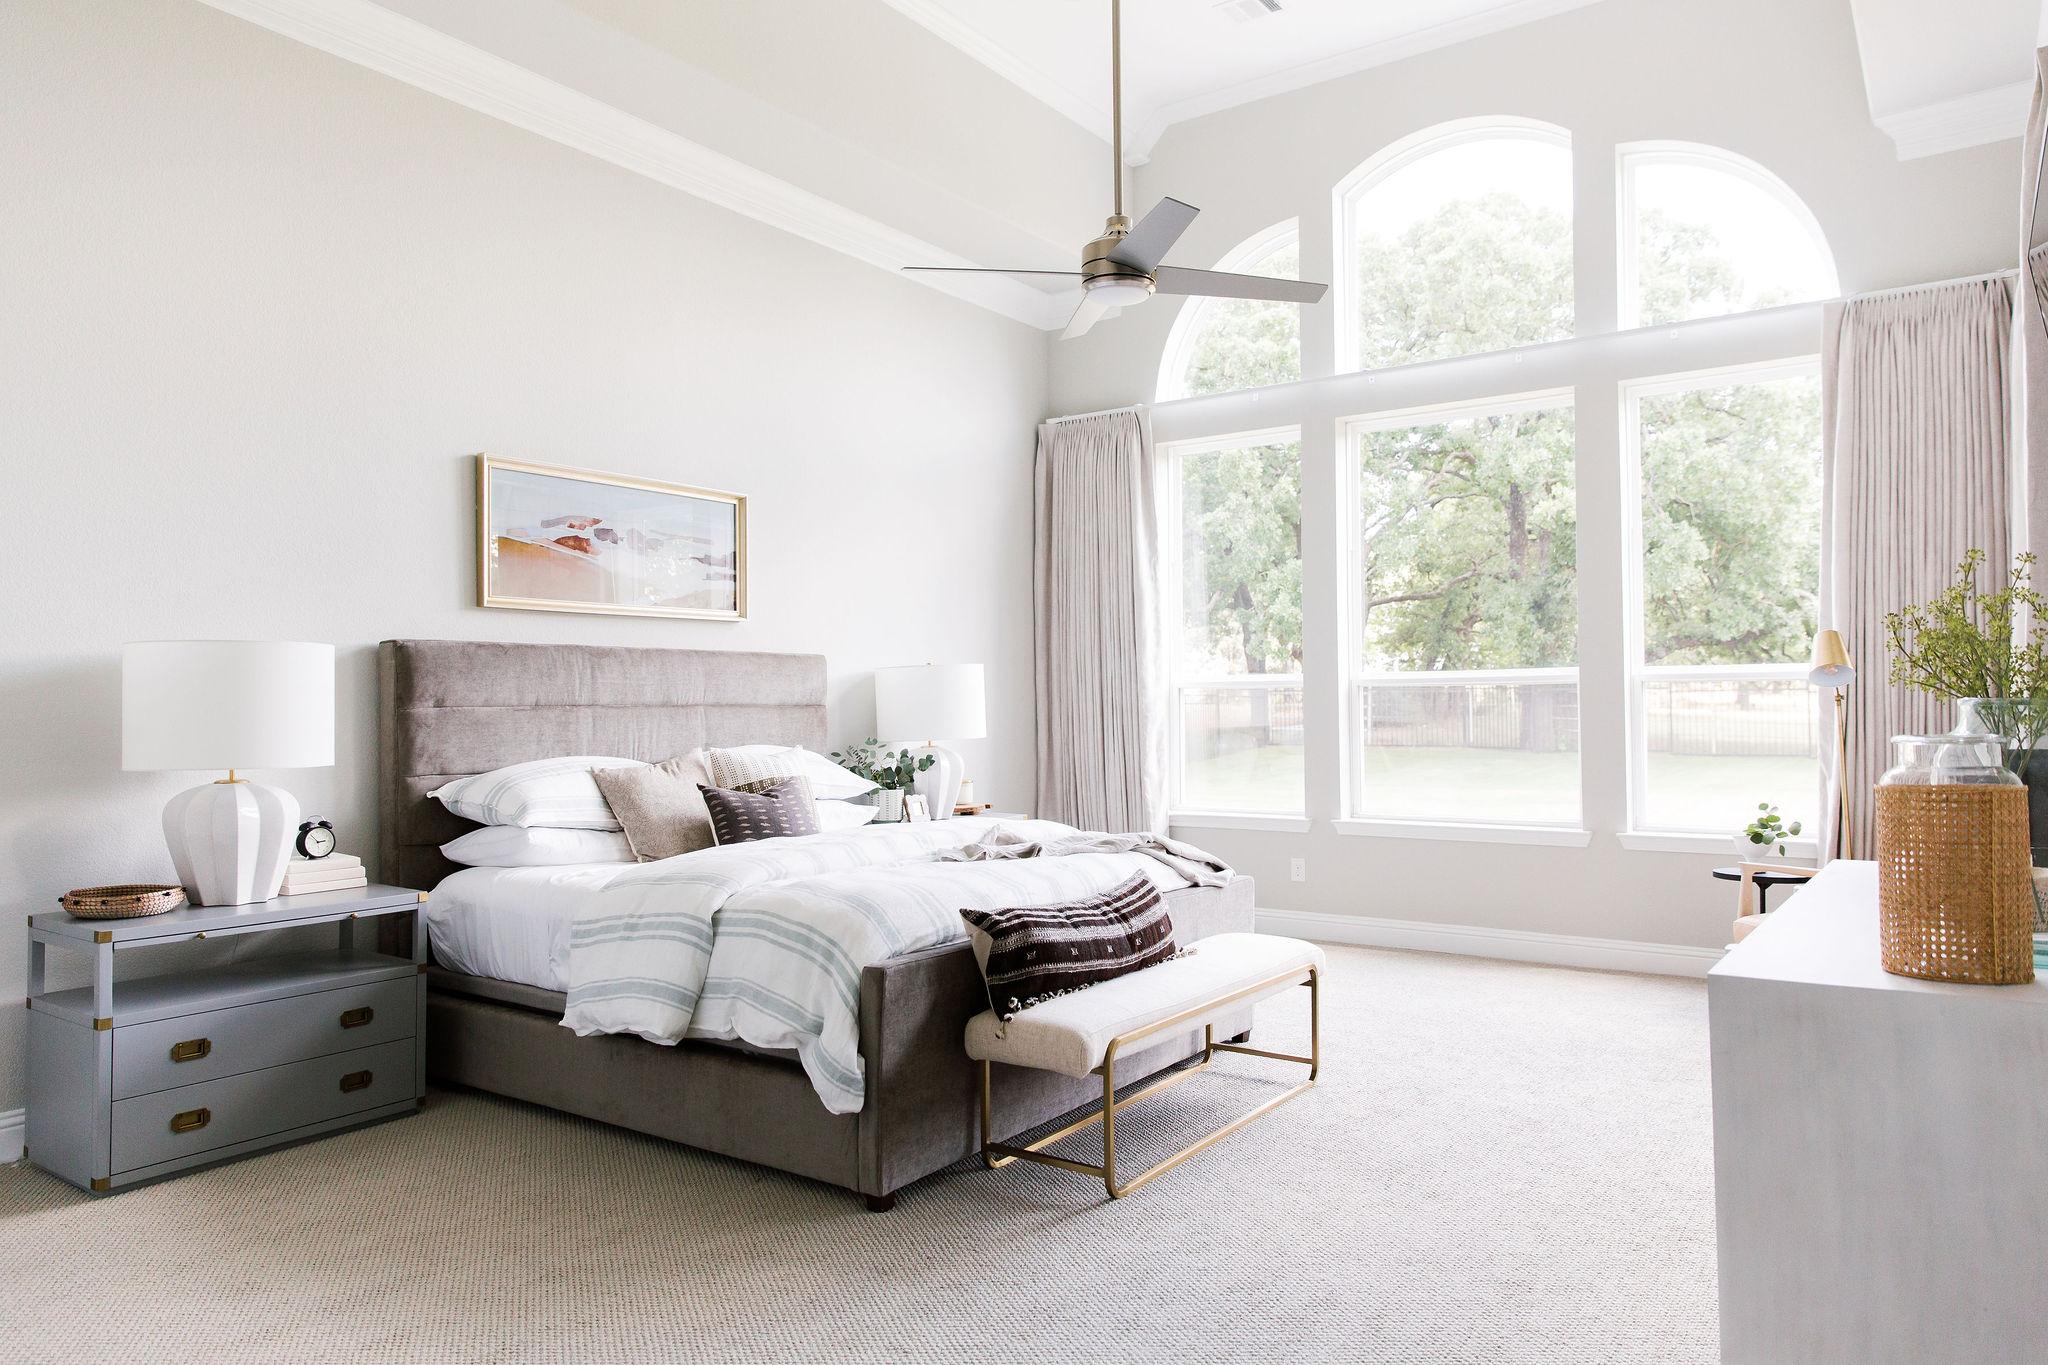 Bedroom design using earthy color palett